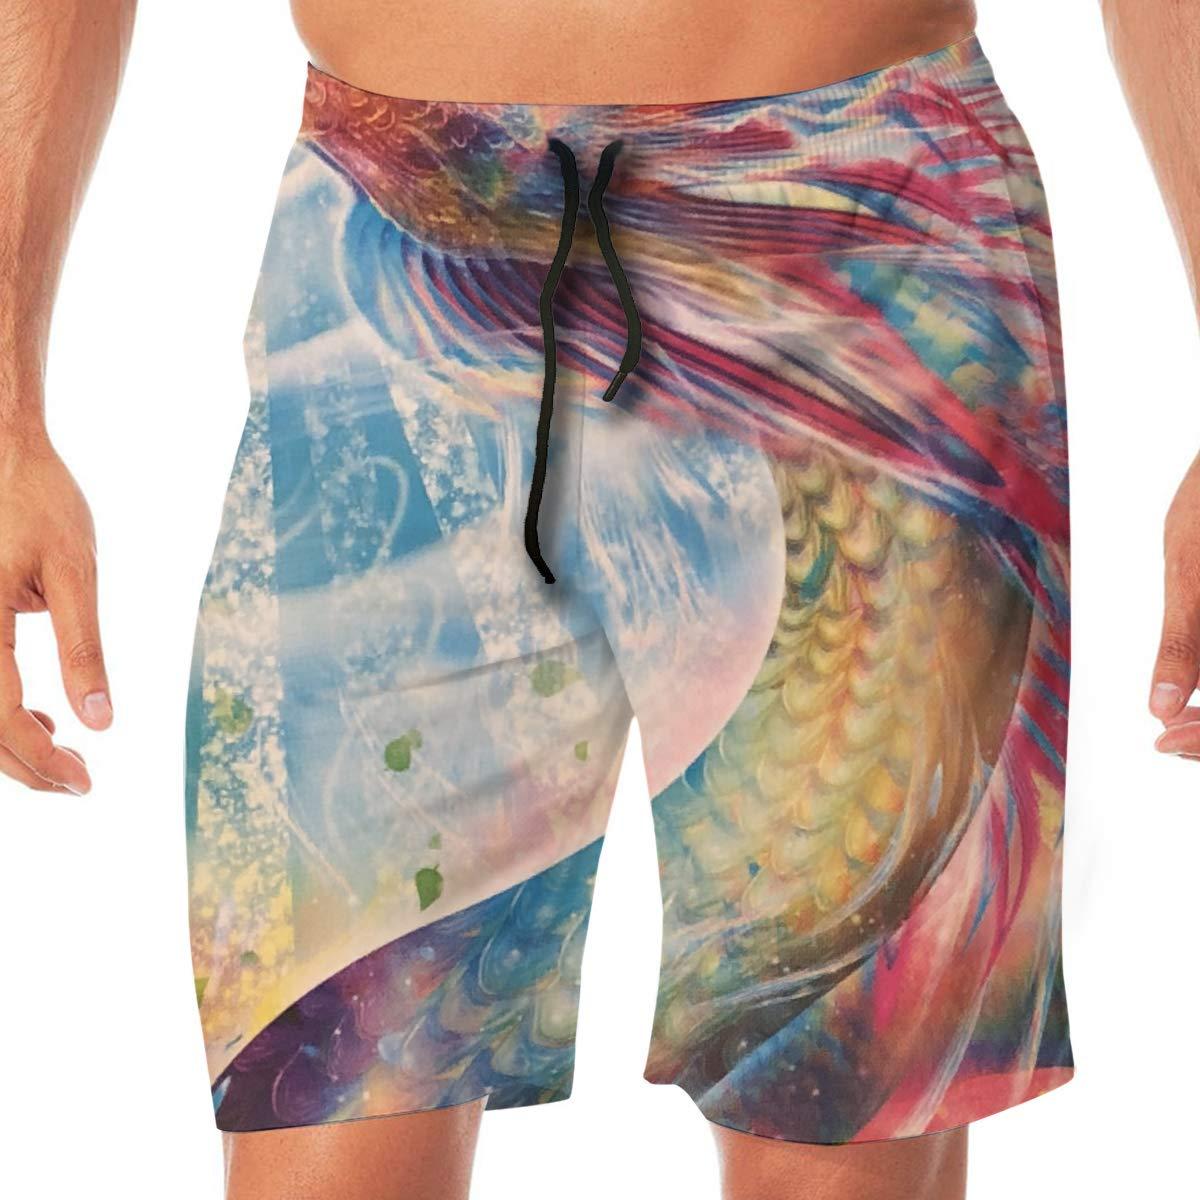 HFSST Rainbow Dragon Shining in The Sun Men Kid Male Summer Swimming Pockets Trunks Beachwear Asual Shorts Pants Mesh